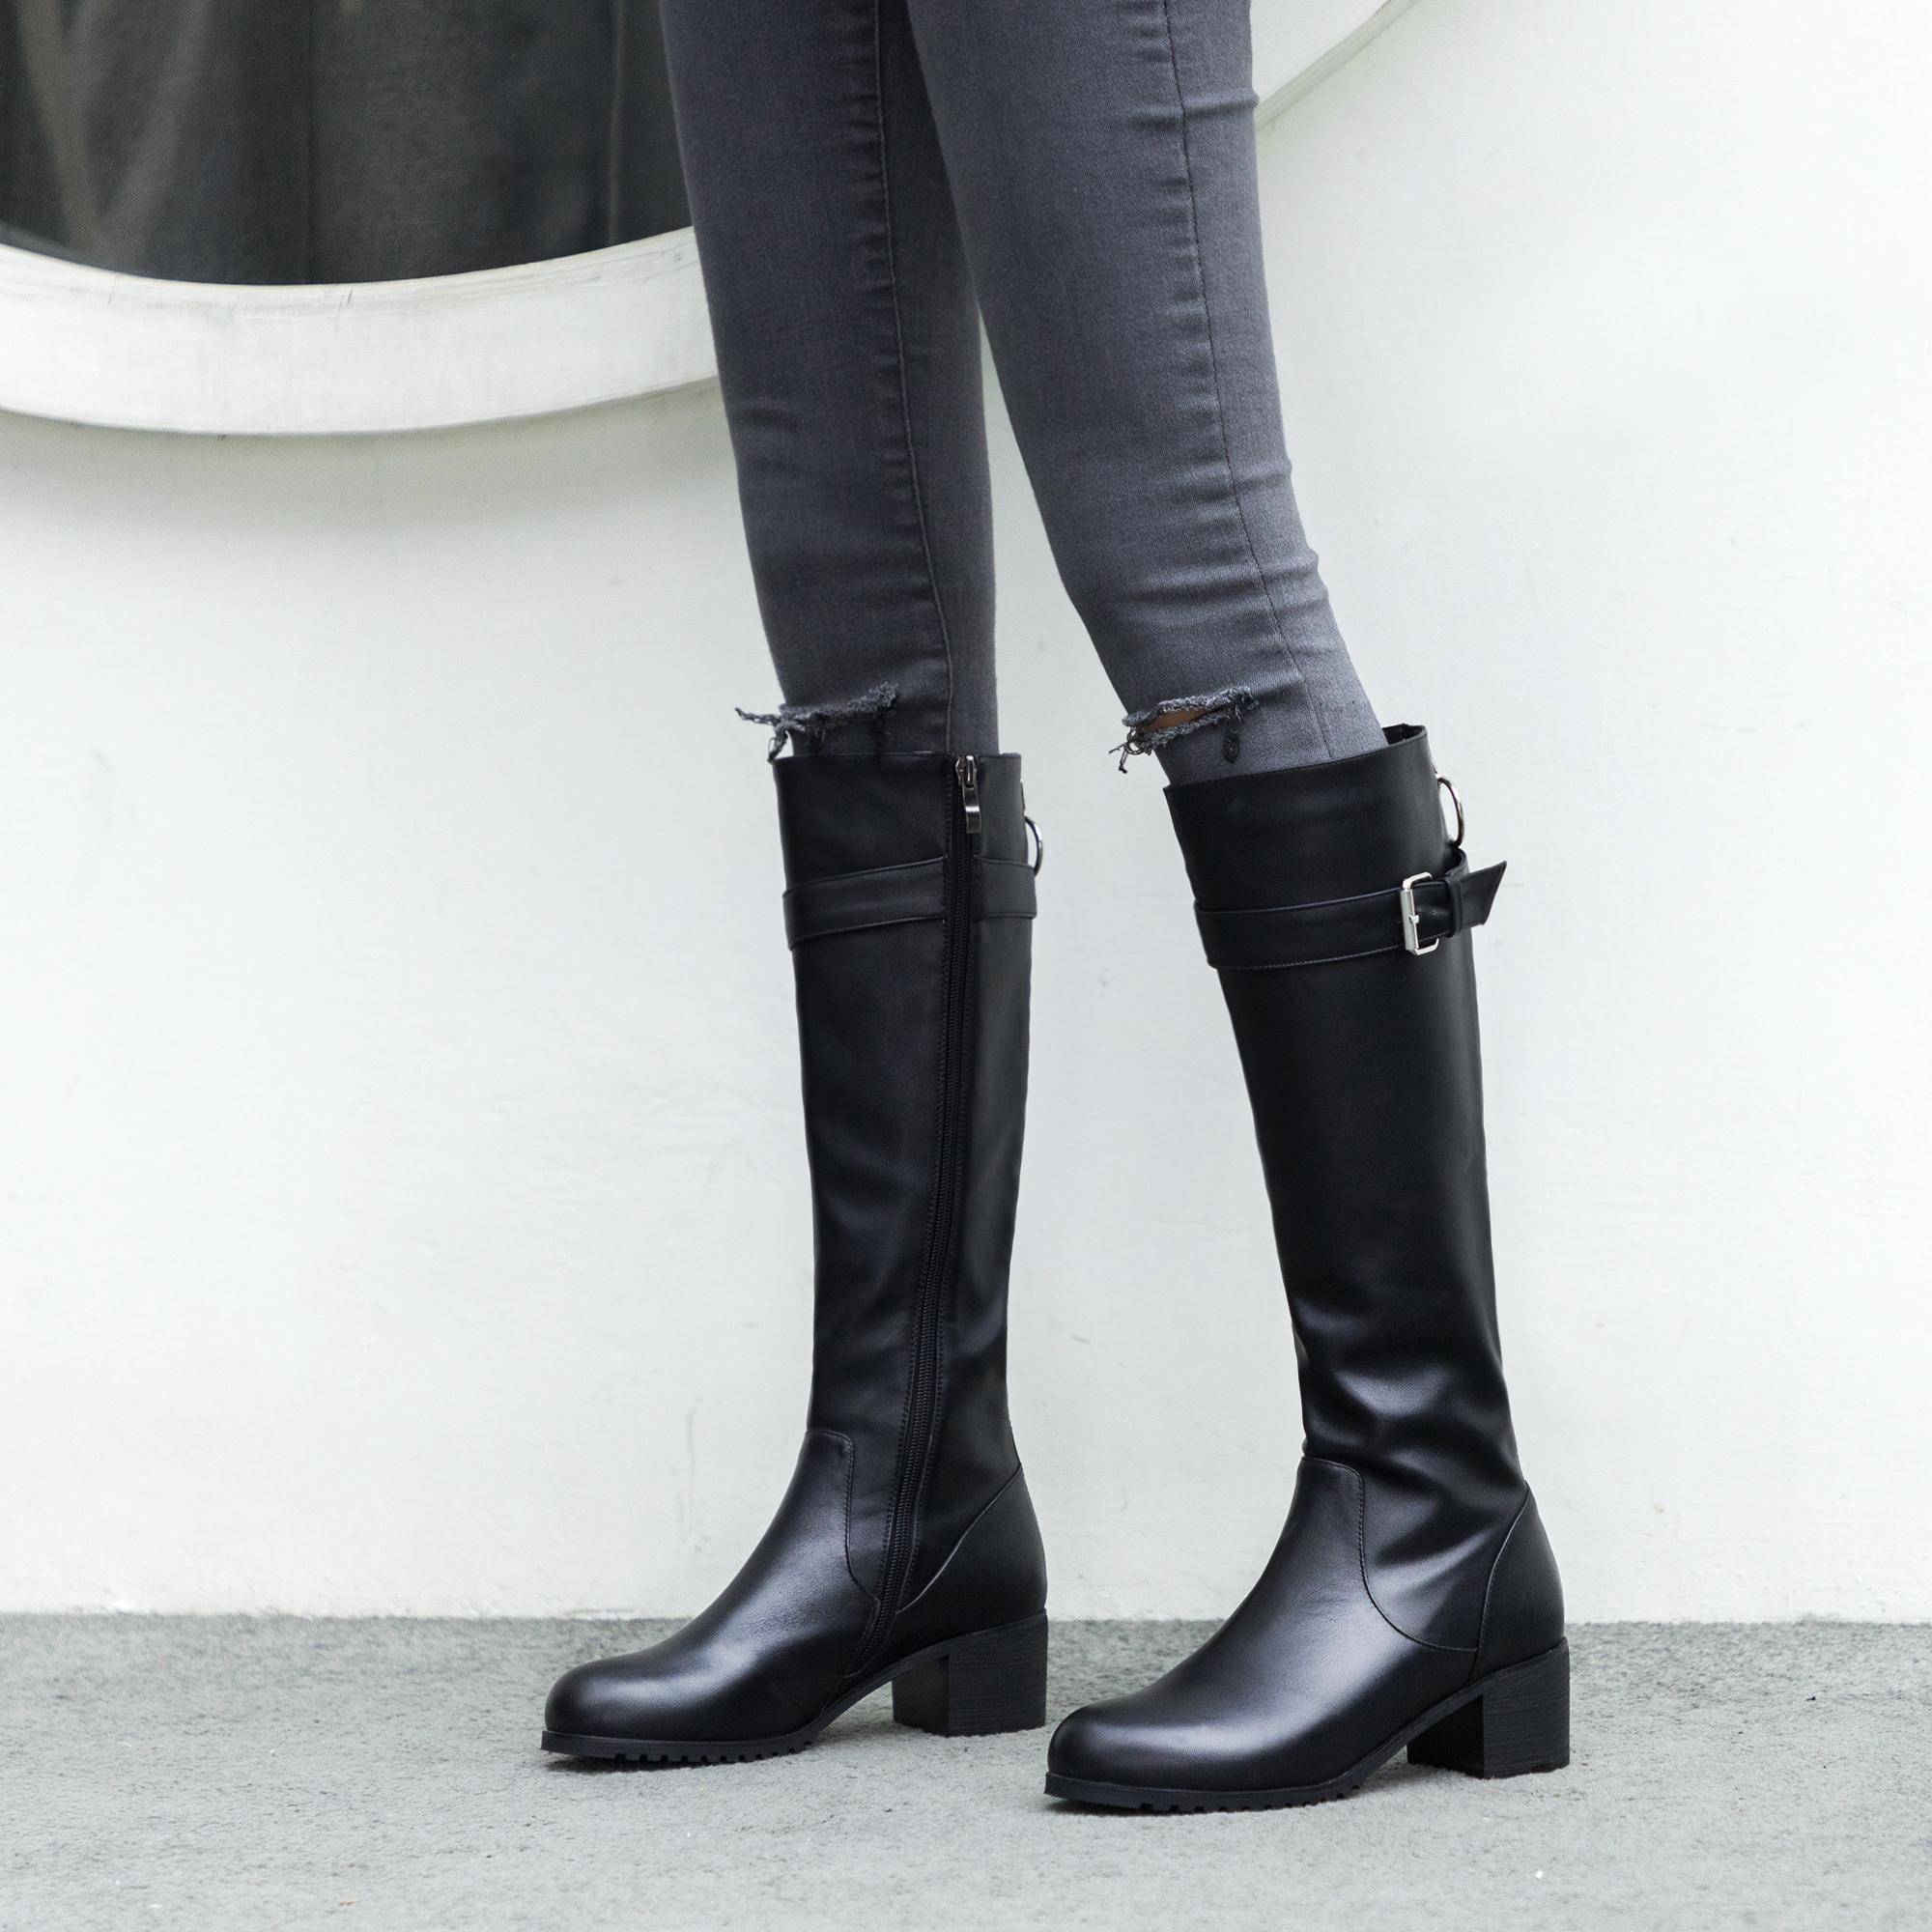 Fashion elegant ladies boots concise